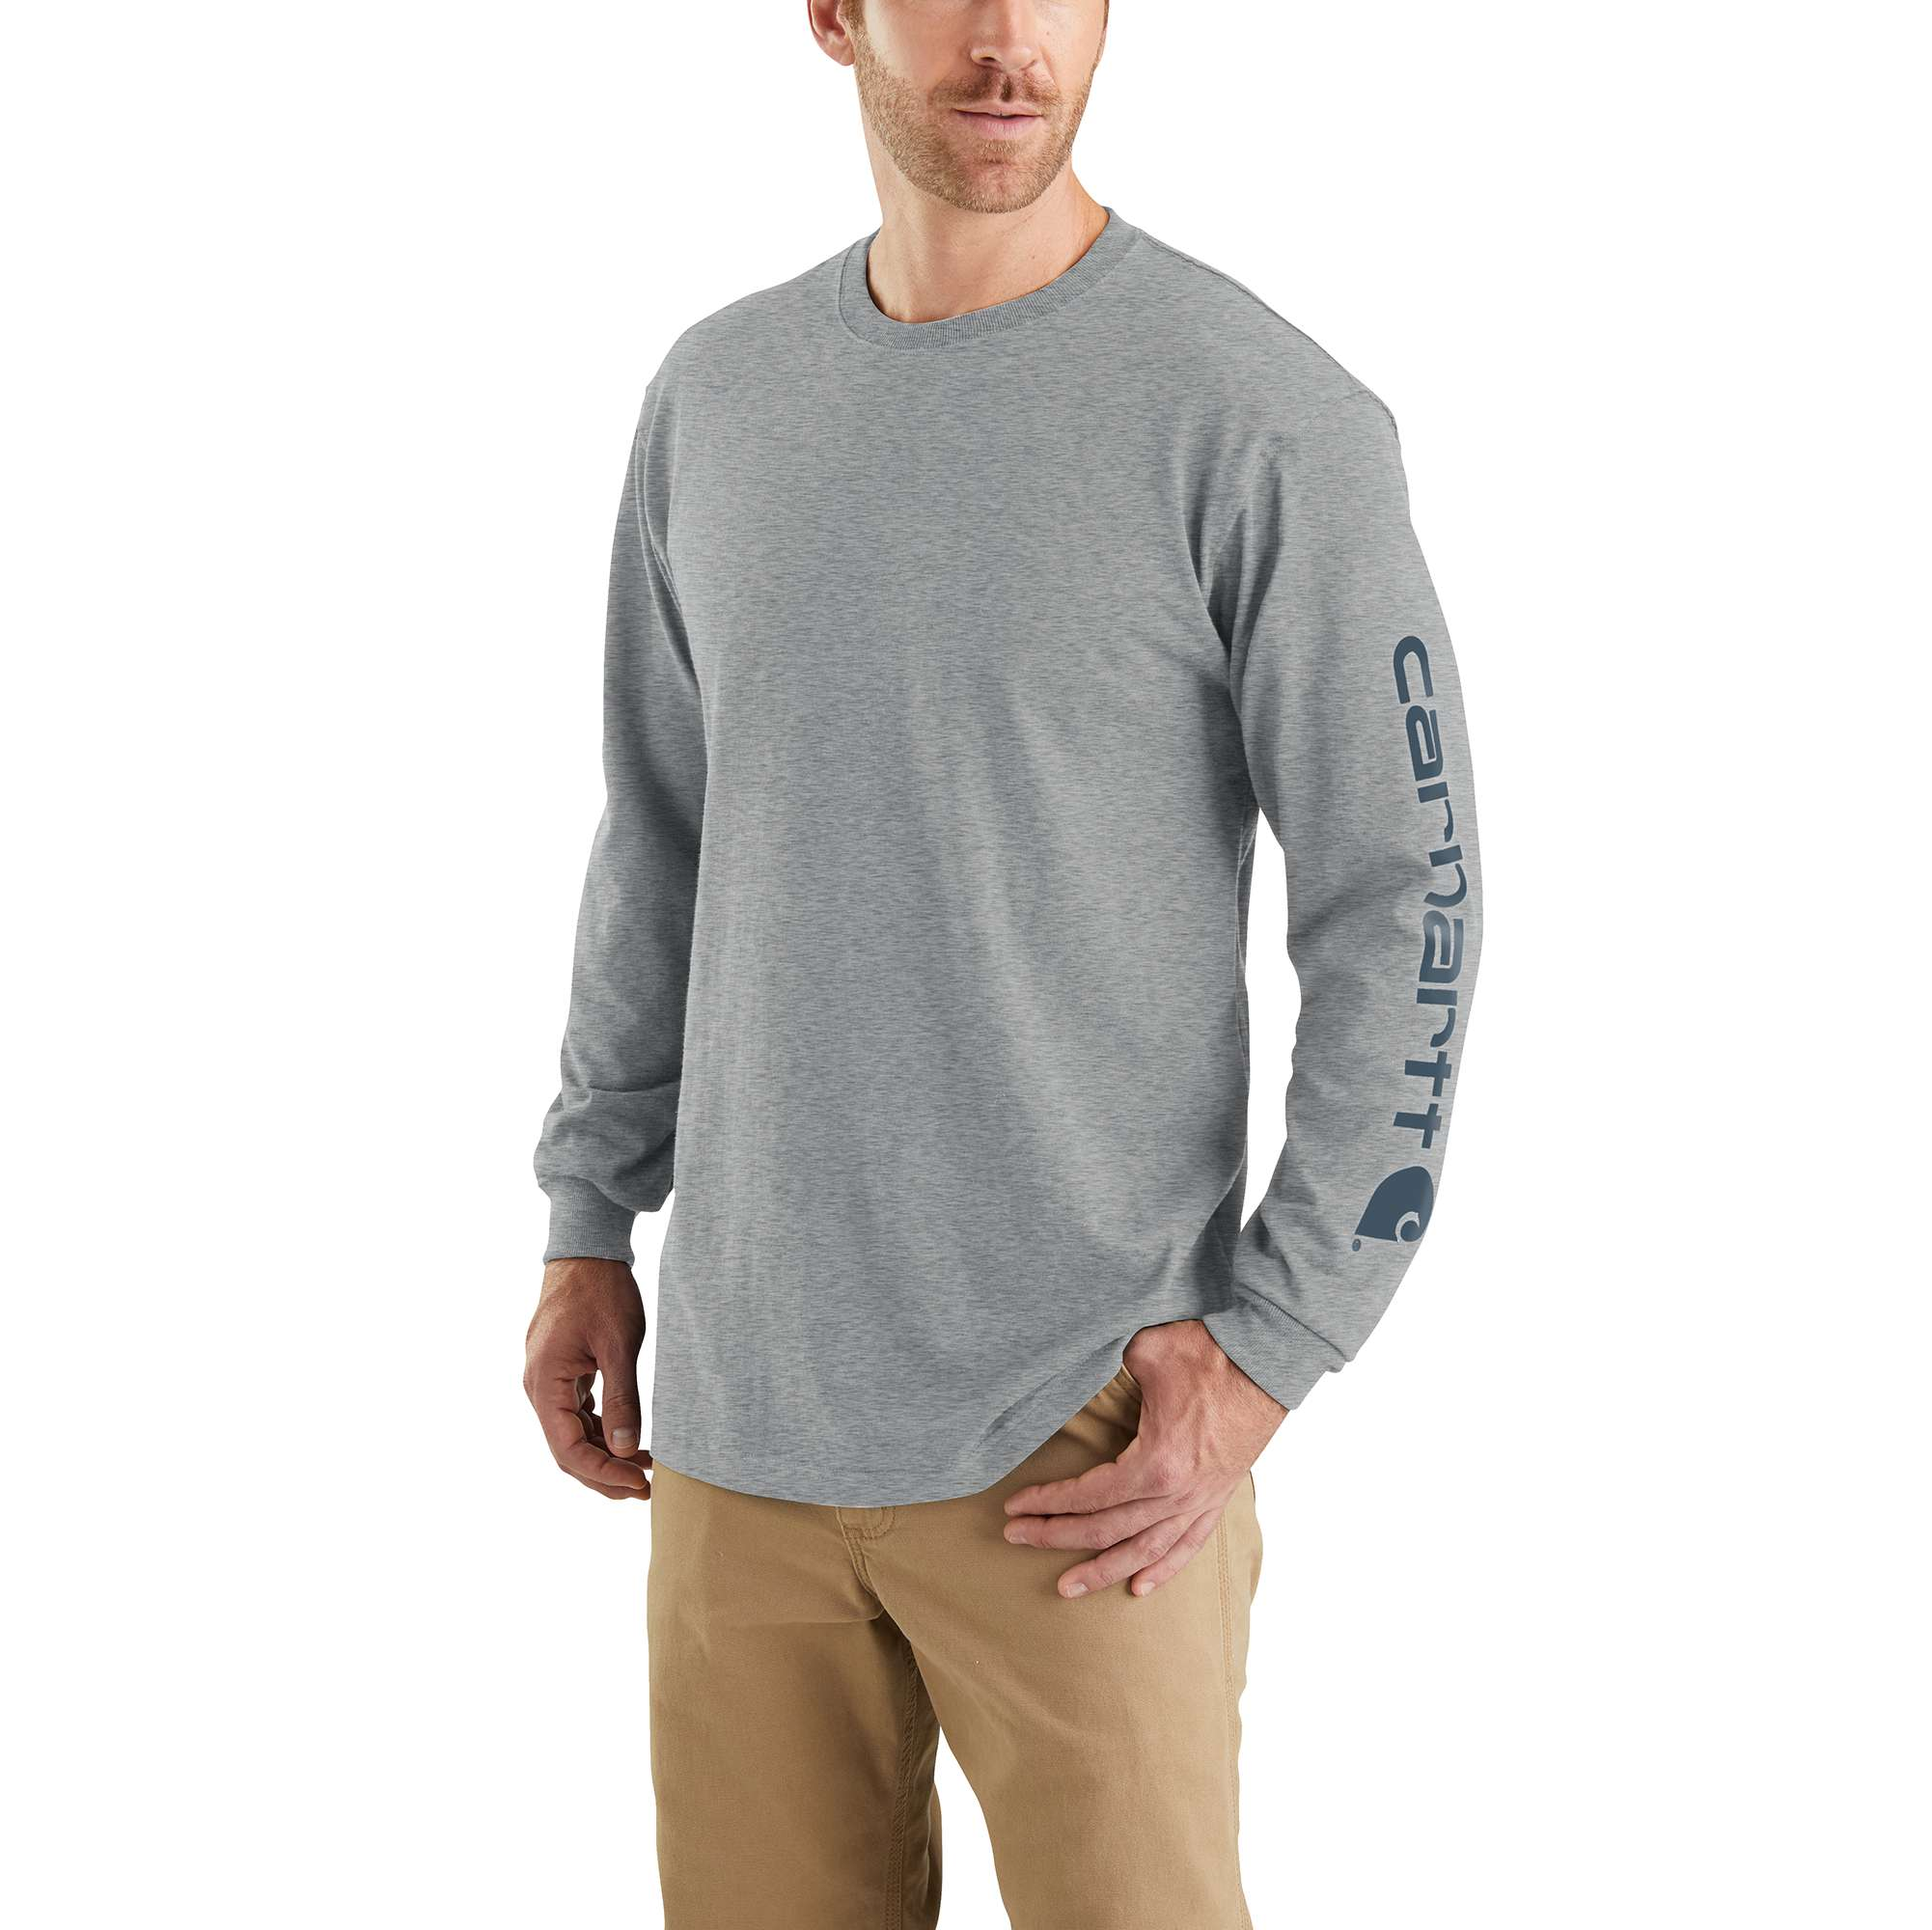 Men's Workwear Long-Sleeve Graphic Logo T-Shirt, Granite, swatch